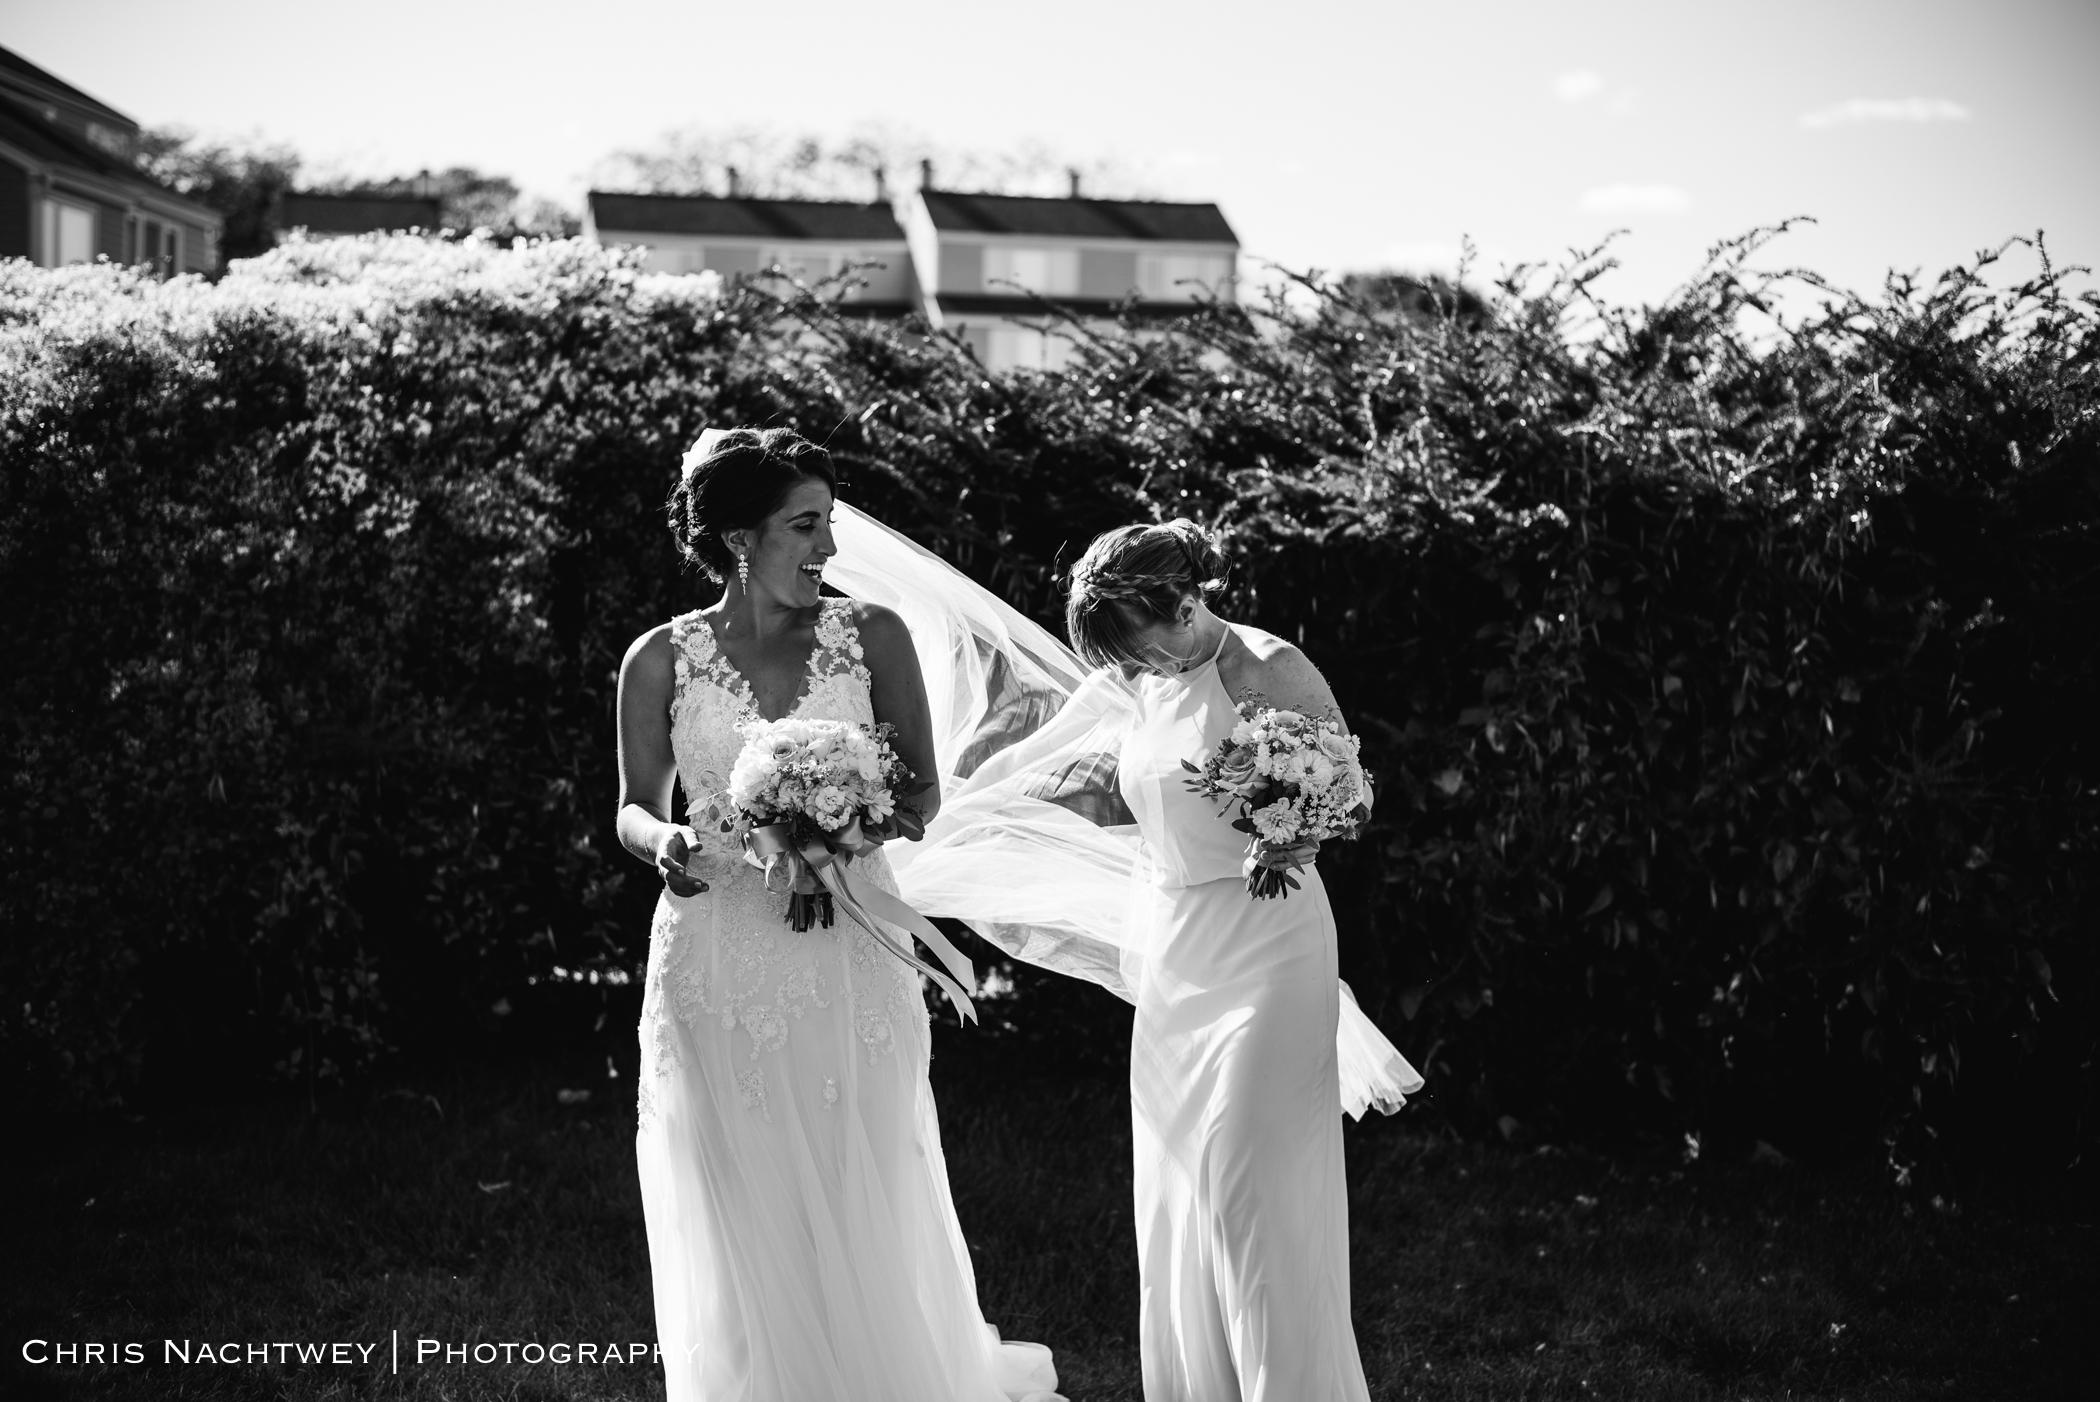 artistic-ct-wedding-photographers-chris-nachtwey-2017-35.jpg